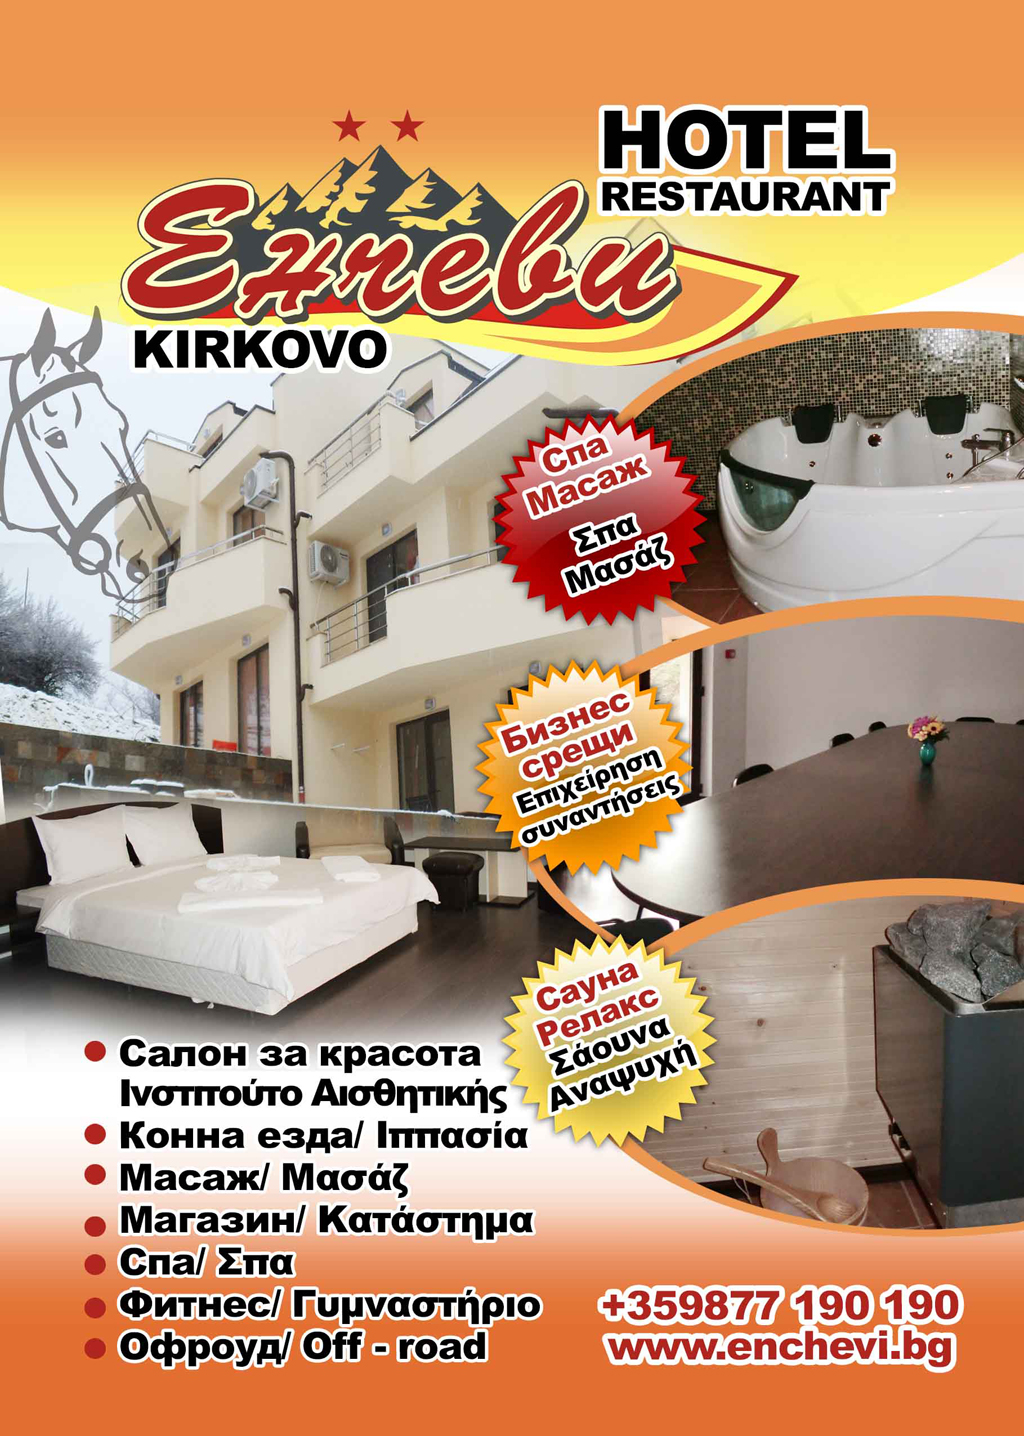 Хотел Енчеви